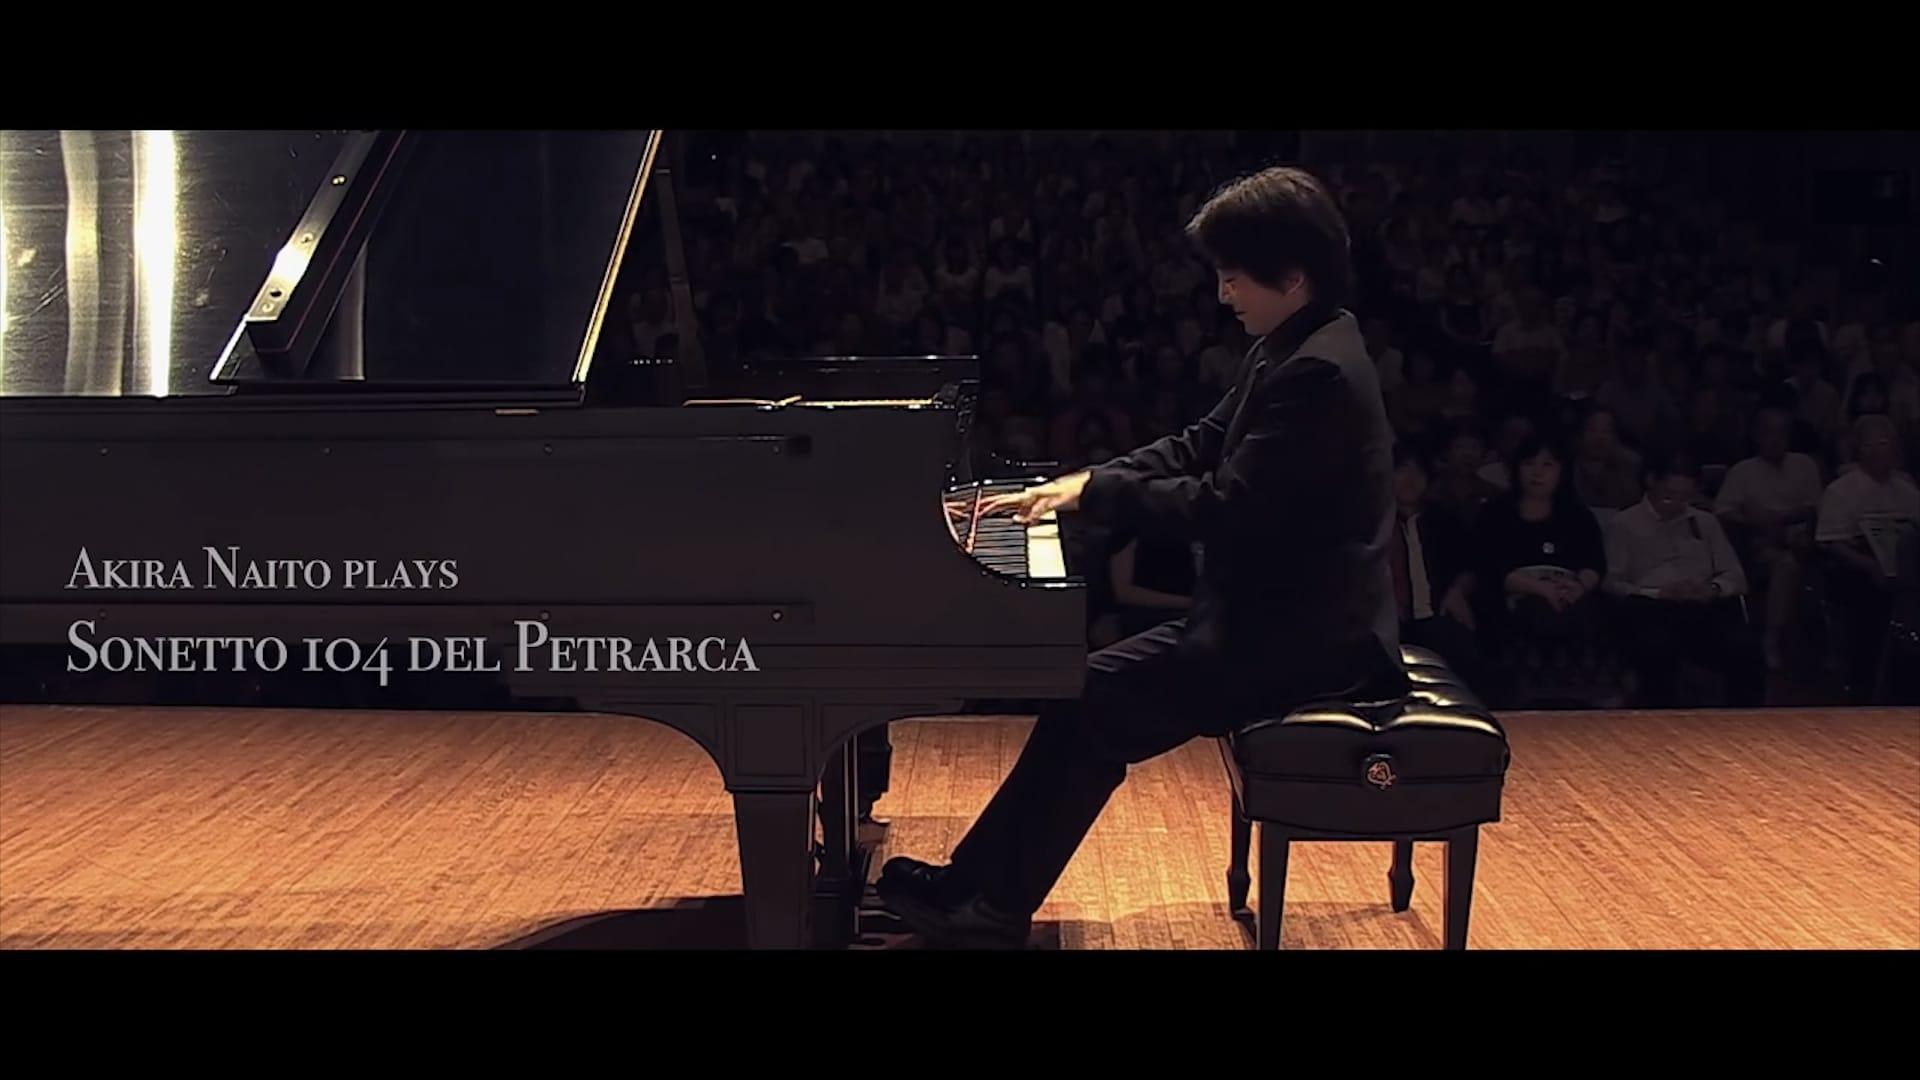 Liszt Sonetto 104 del Petrarca